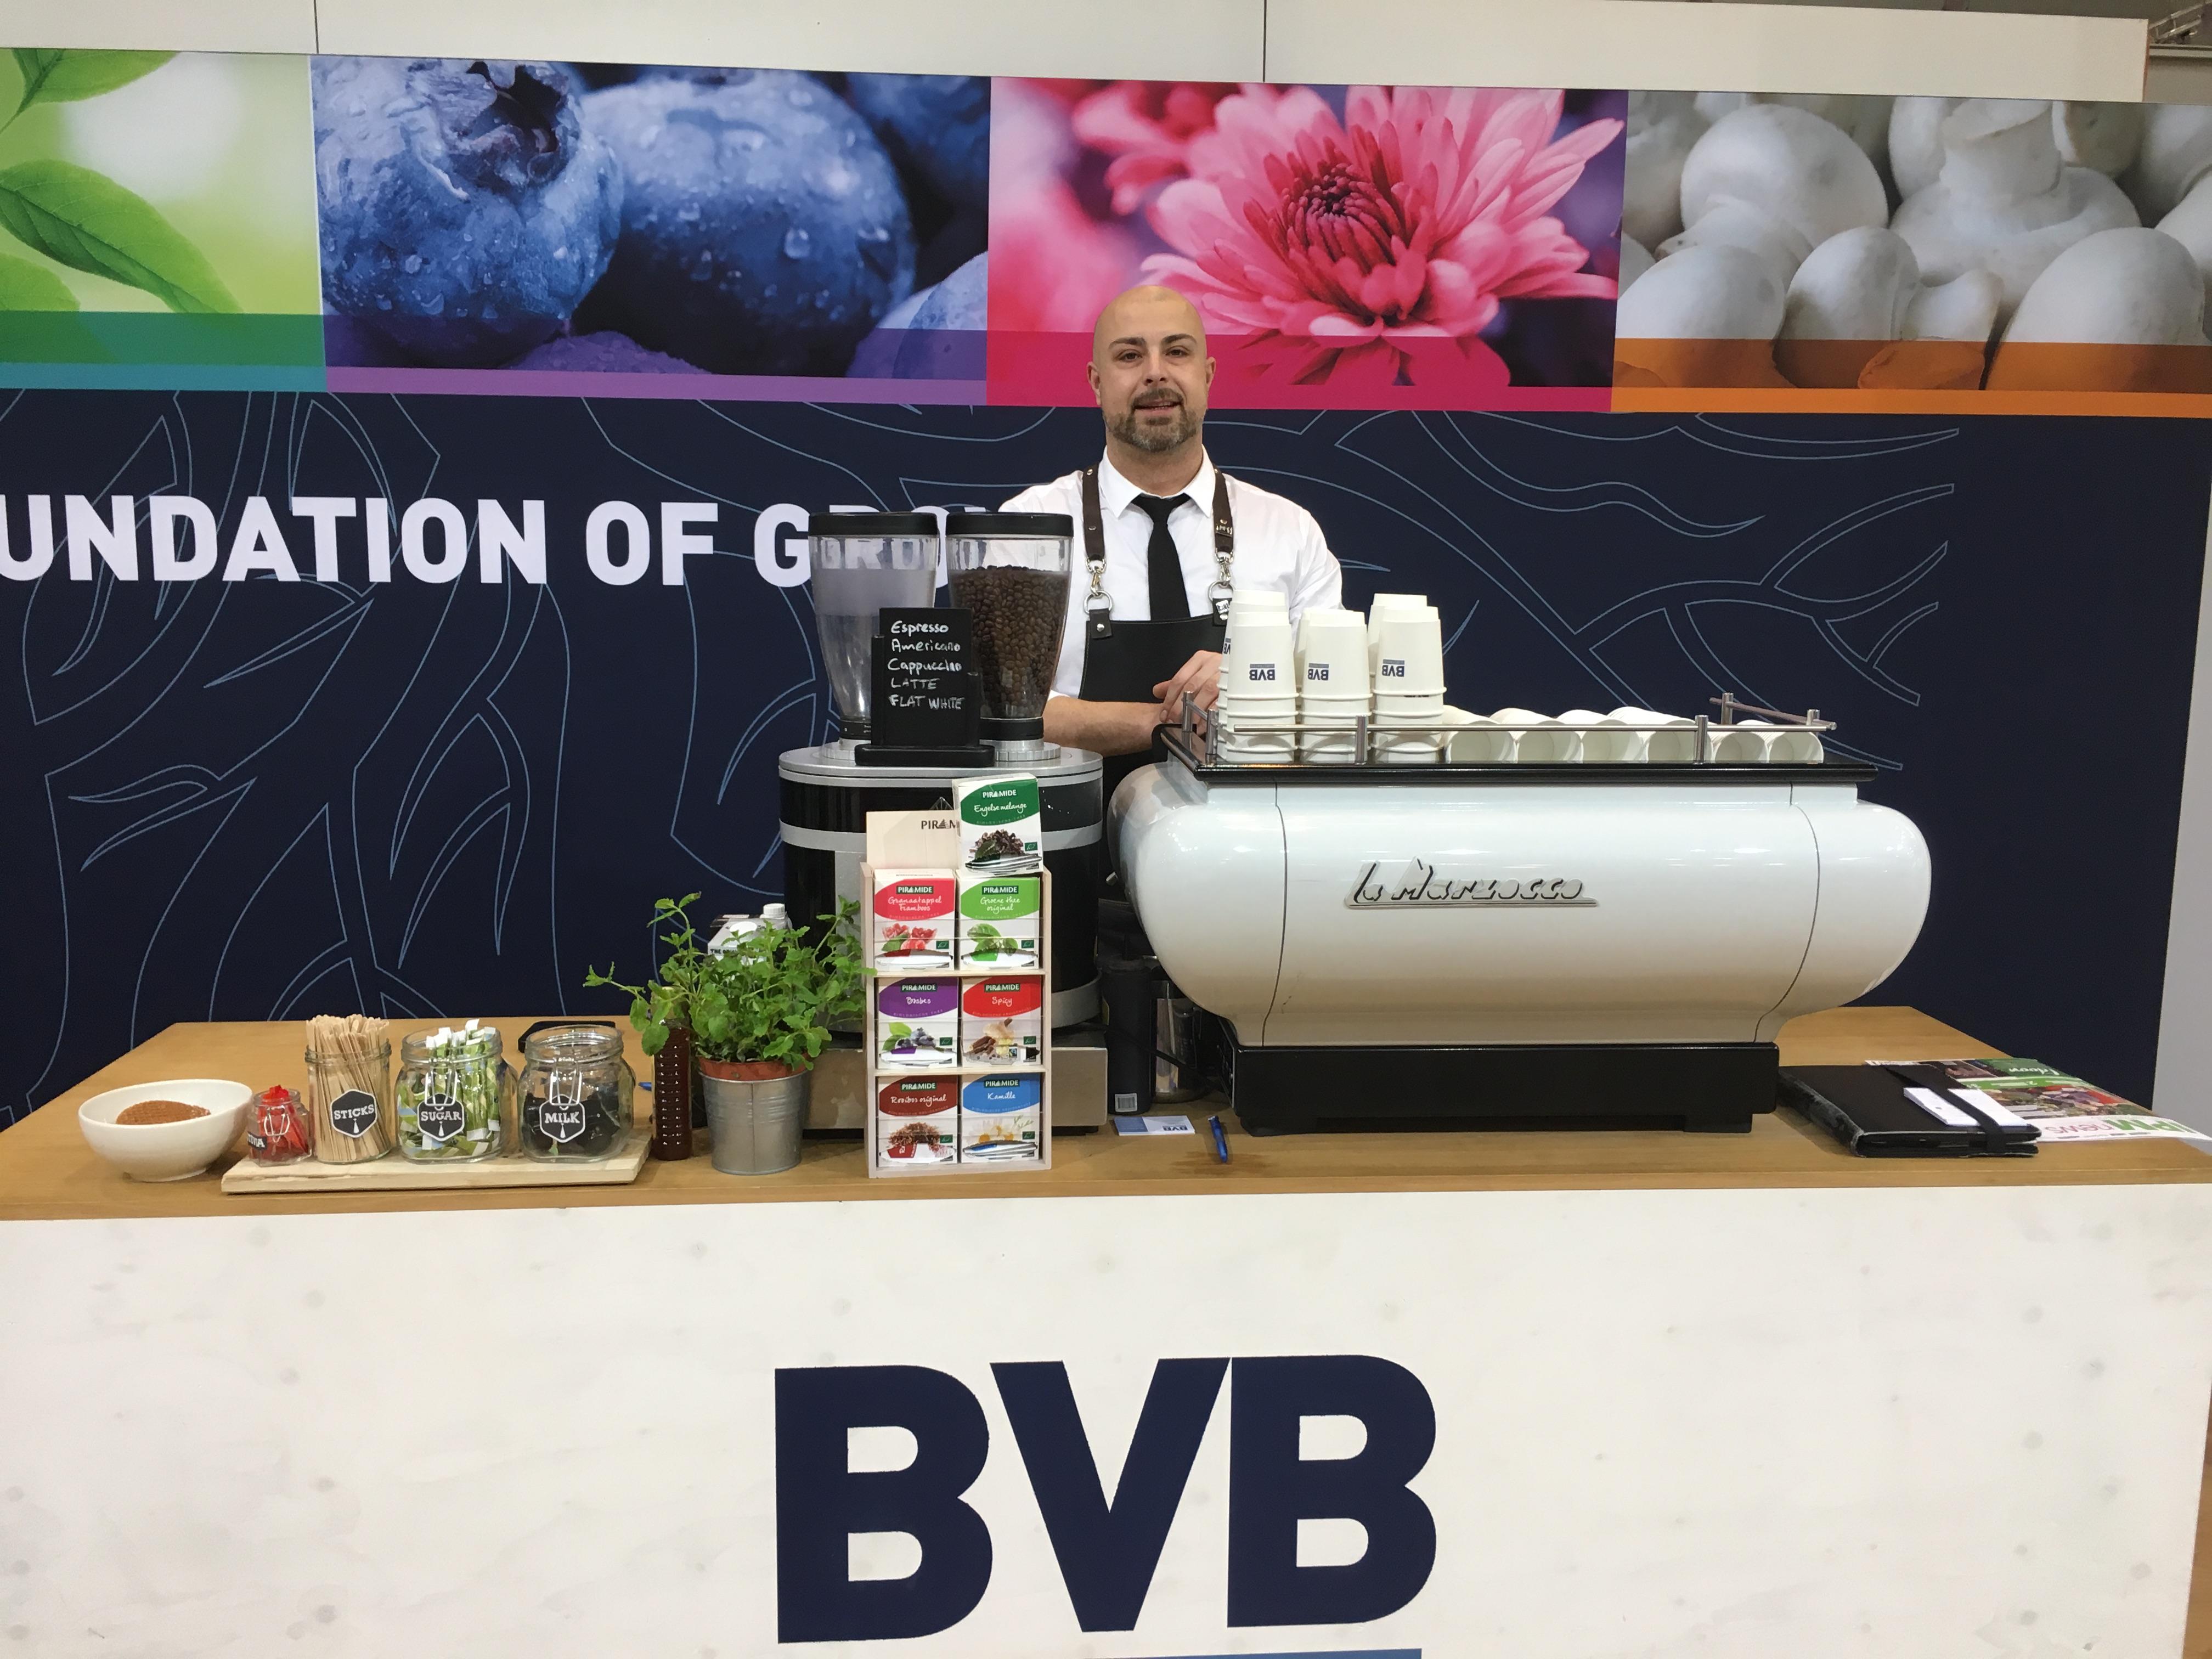 BVB Substrates IPM 2018 Essen Messe6